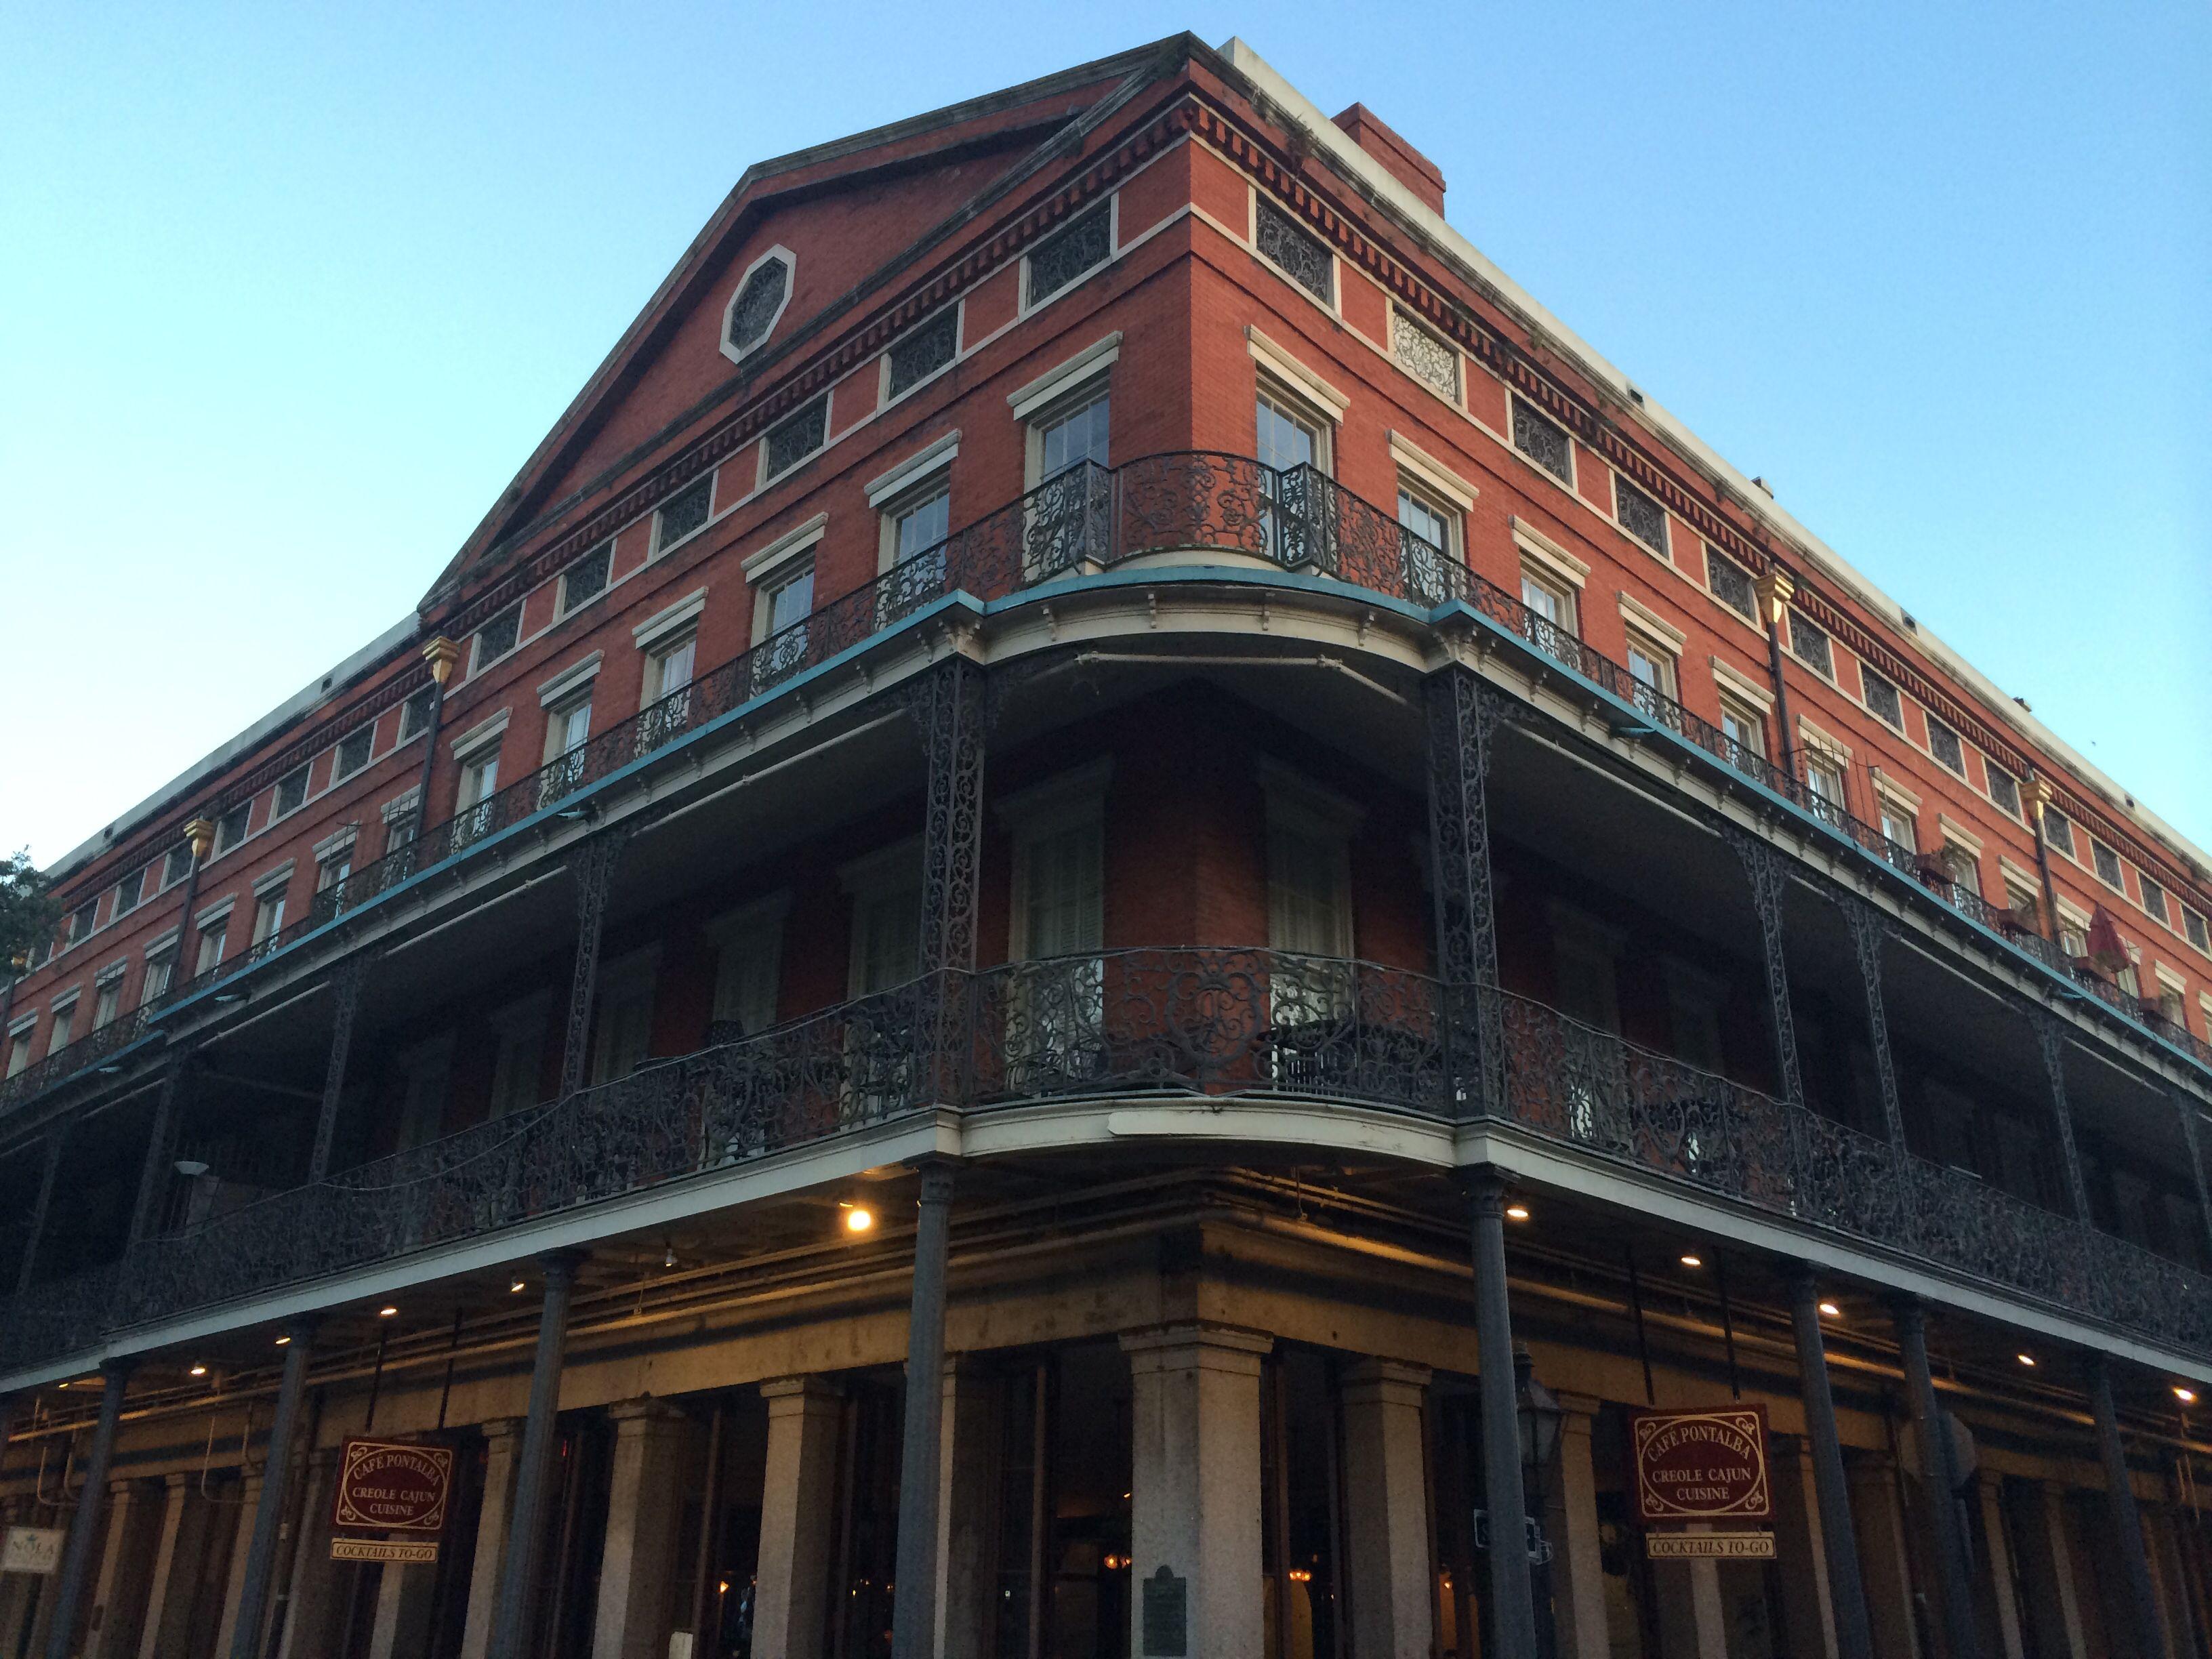 The Upper Pontalba Apartment Building French Quarter New Orleans